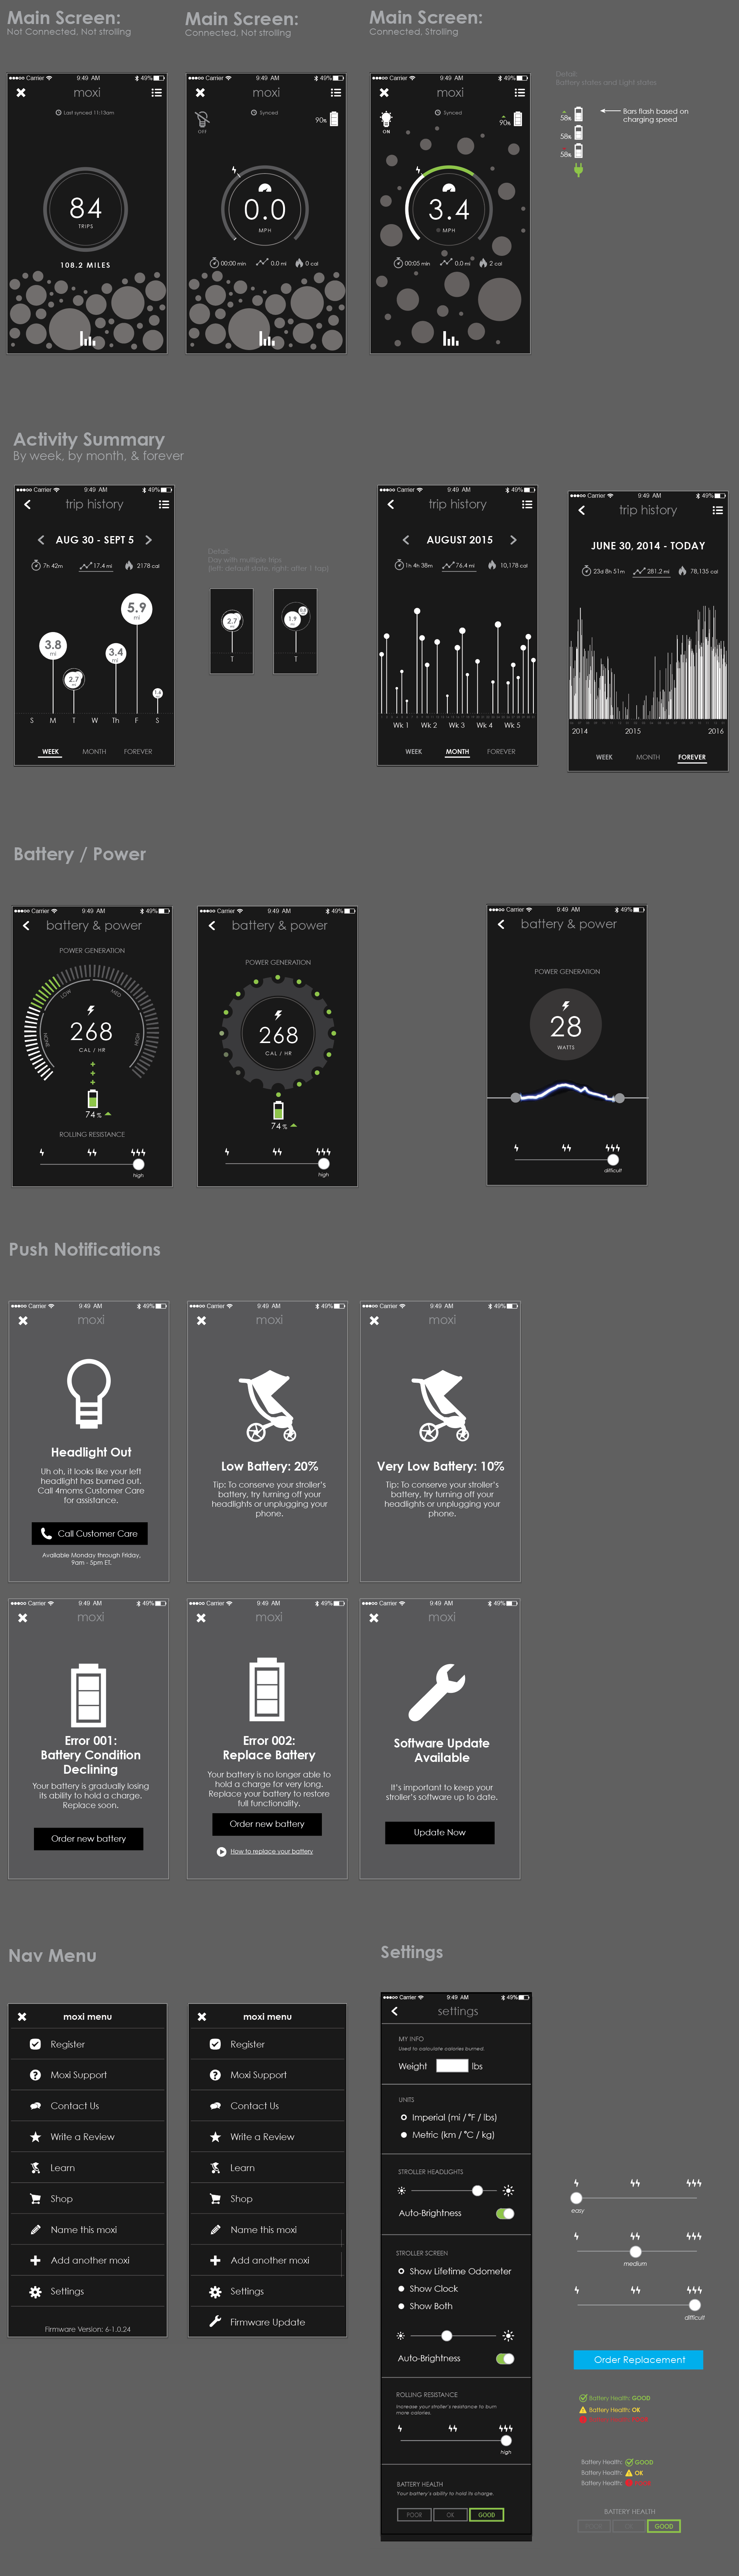 Moxi app wireframes, earlier explorations